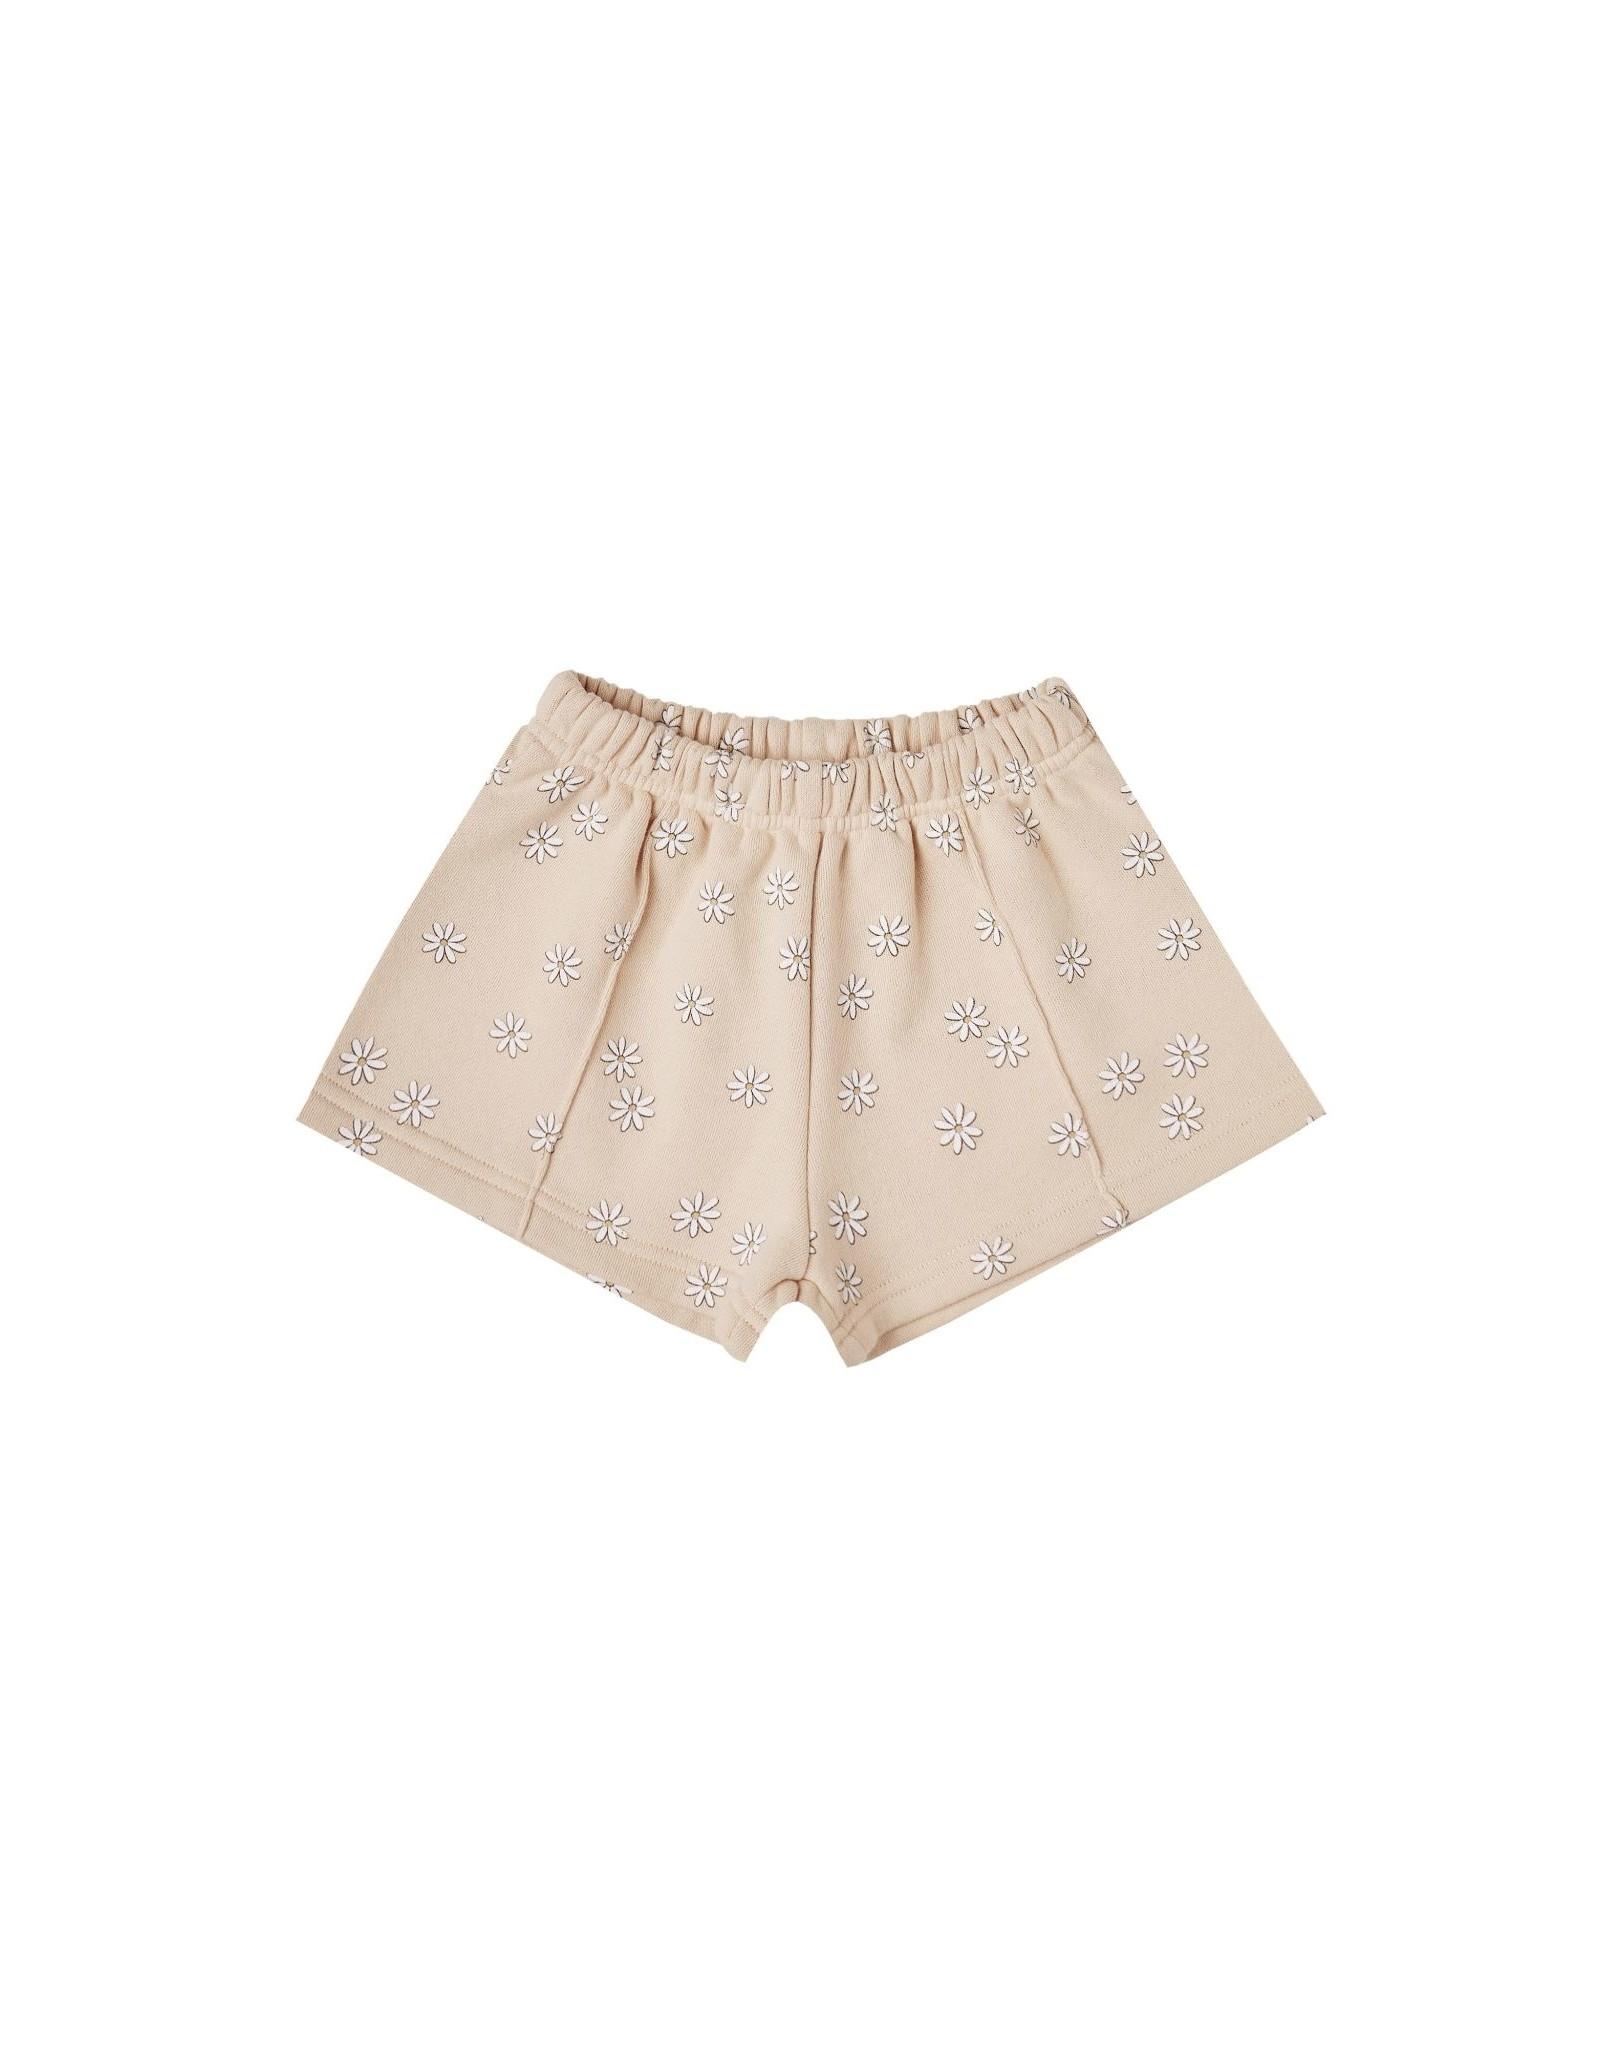 Rylee & Cru Rylee & Cru Daisy Confetti Sweat Short